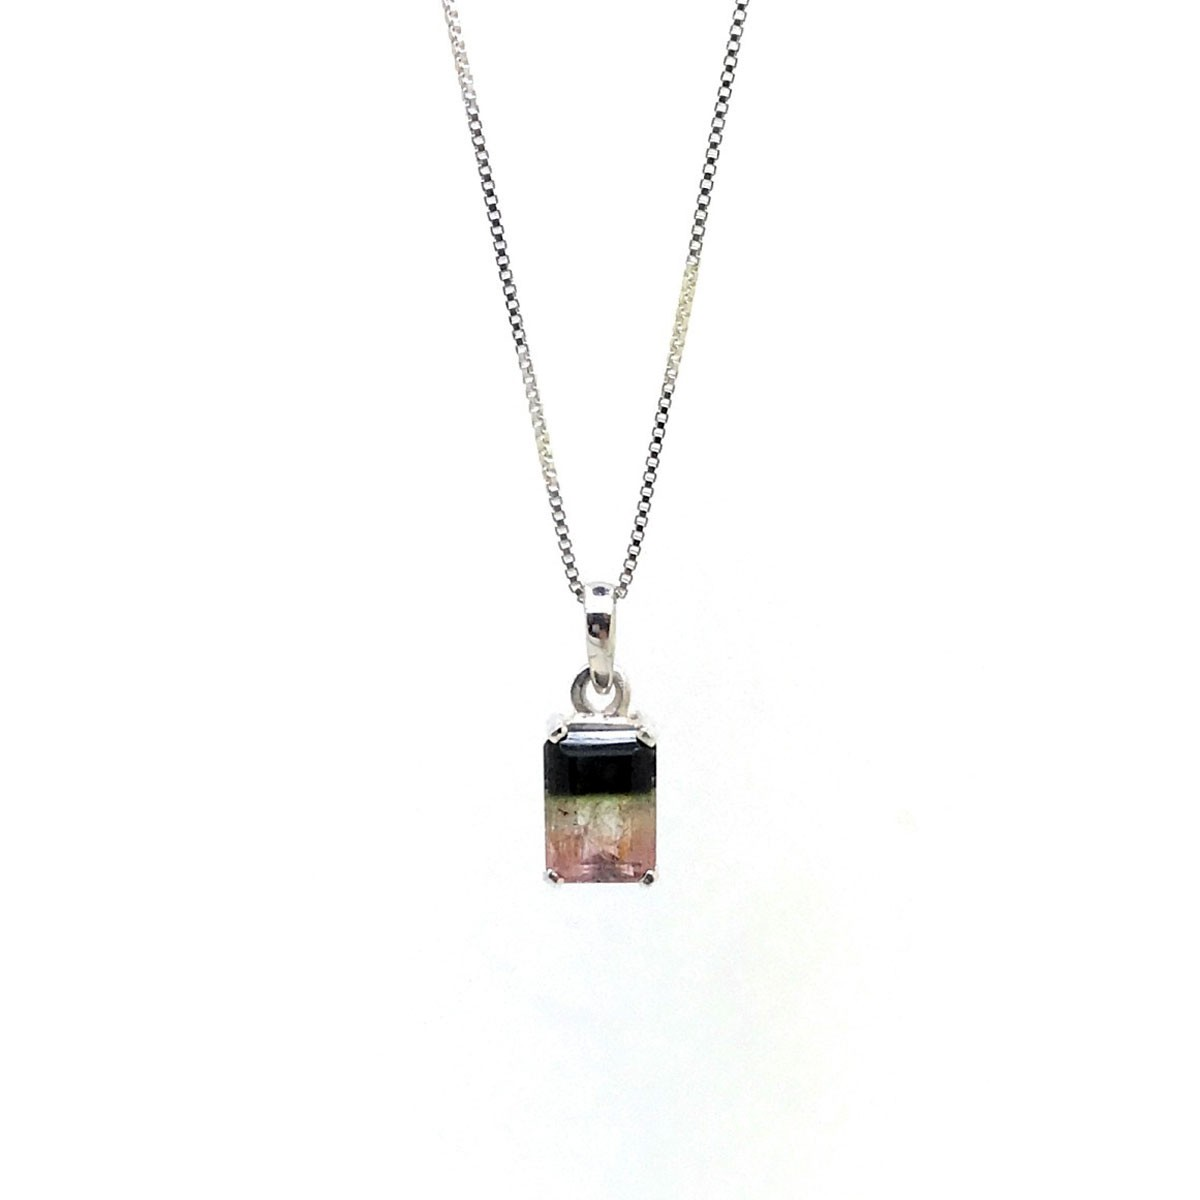 Pingente Turmalina Melancia Bicolor 1,65 Cts Prata De Lei 25772